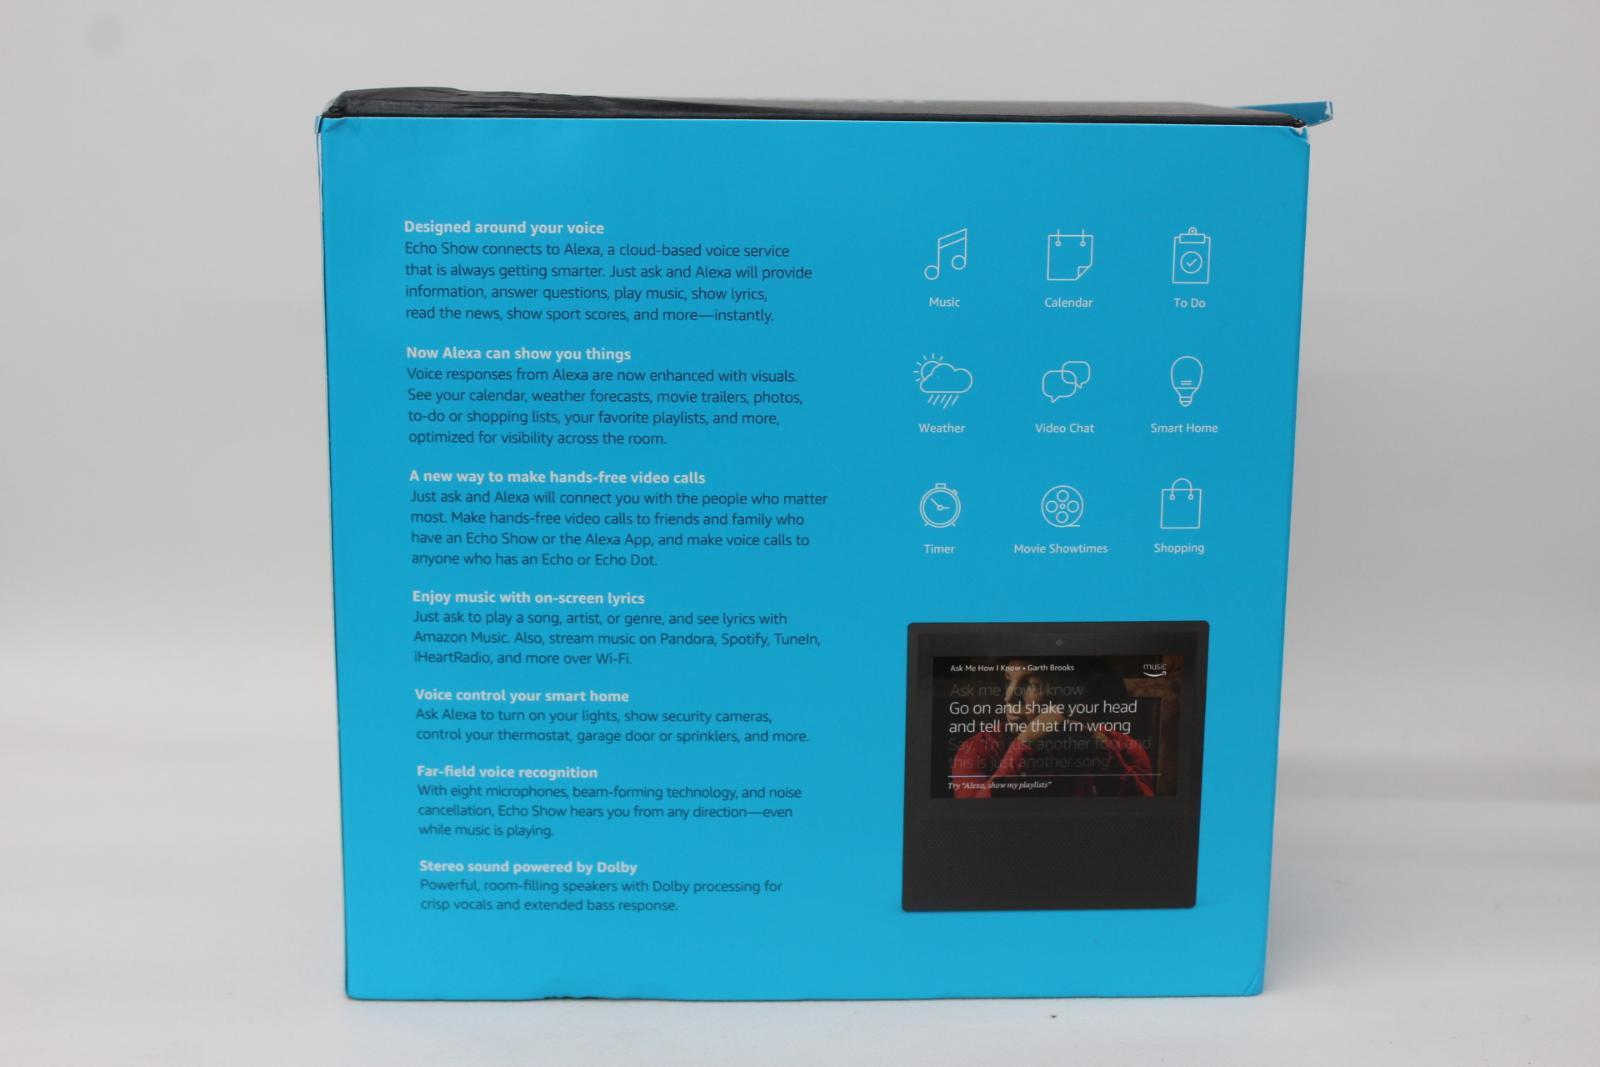 AMAZON-Echo-Show-Alexa-Smart-Assistant-Black-1st-Generation-7-034-Display-NEW thumbnail 5